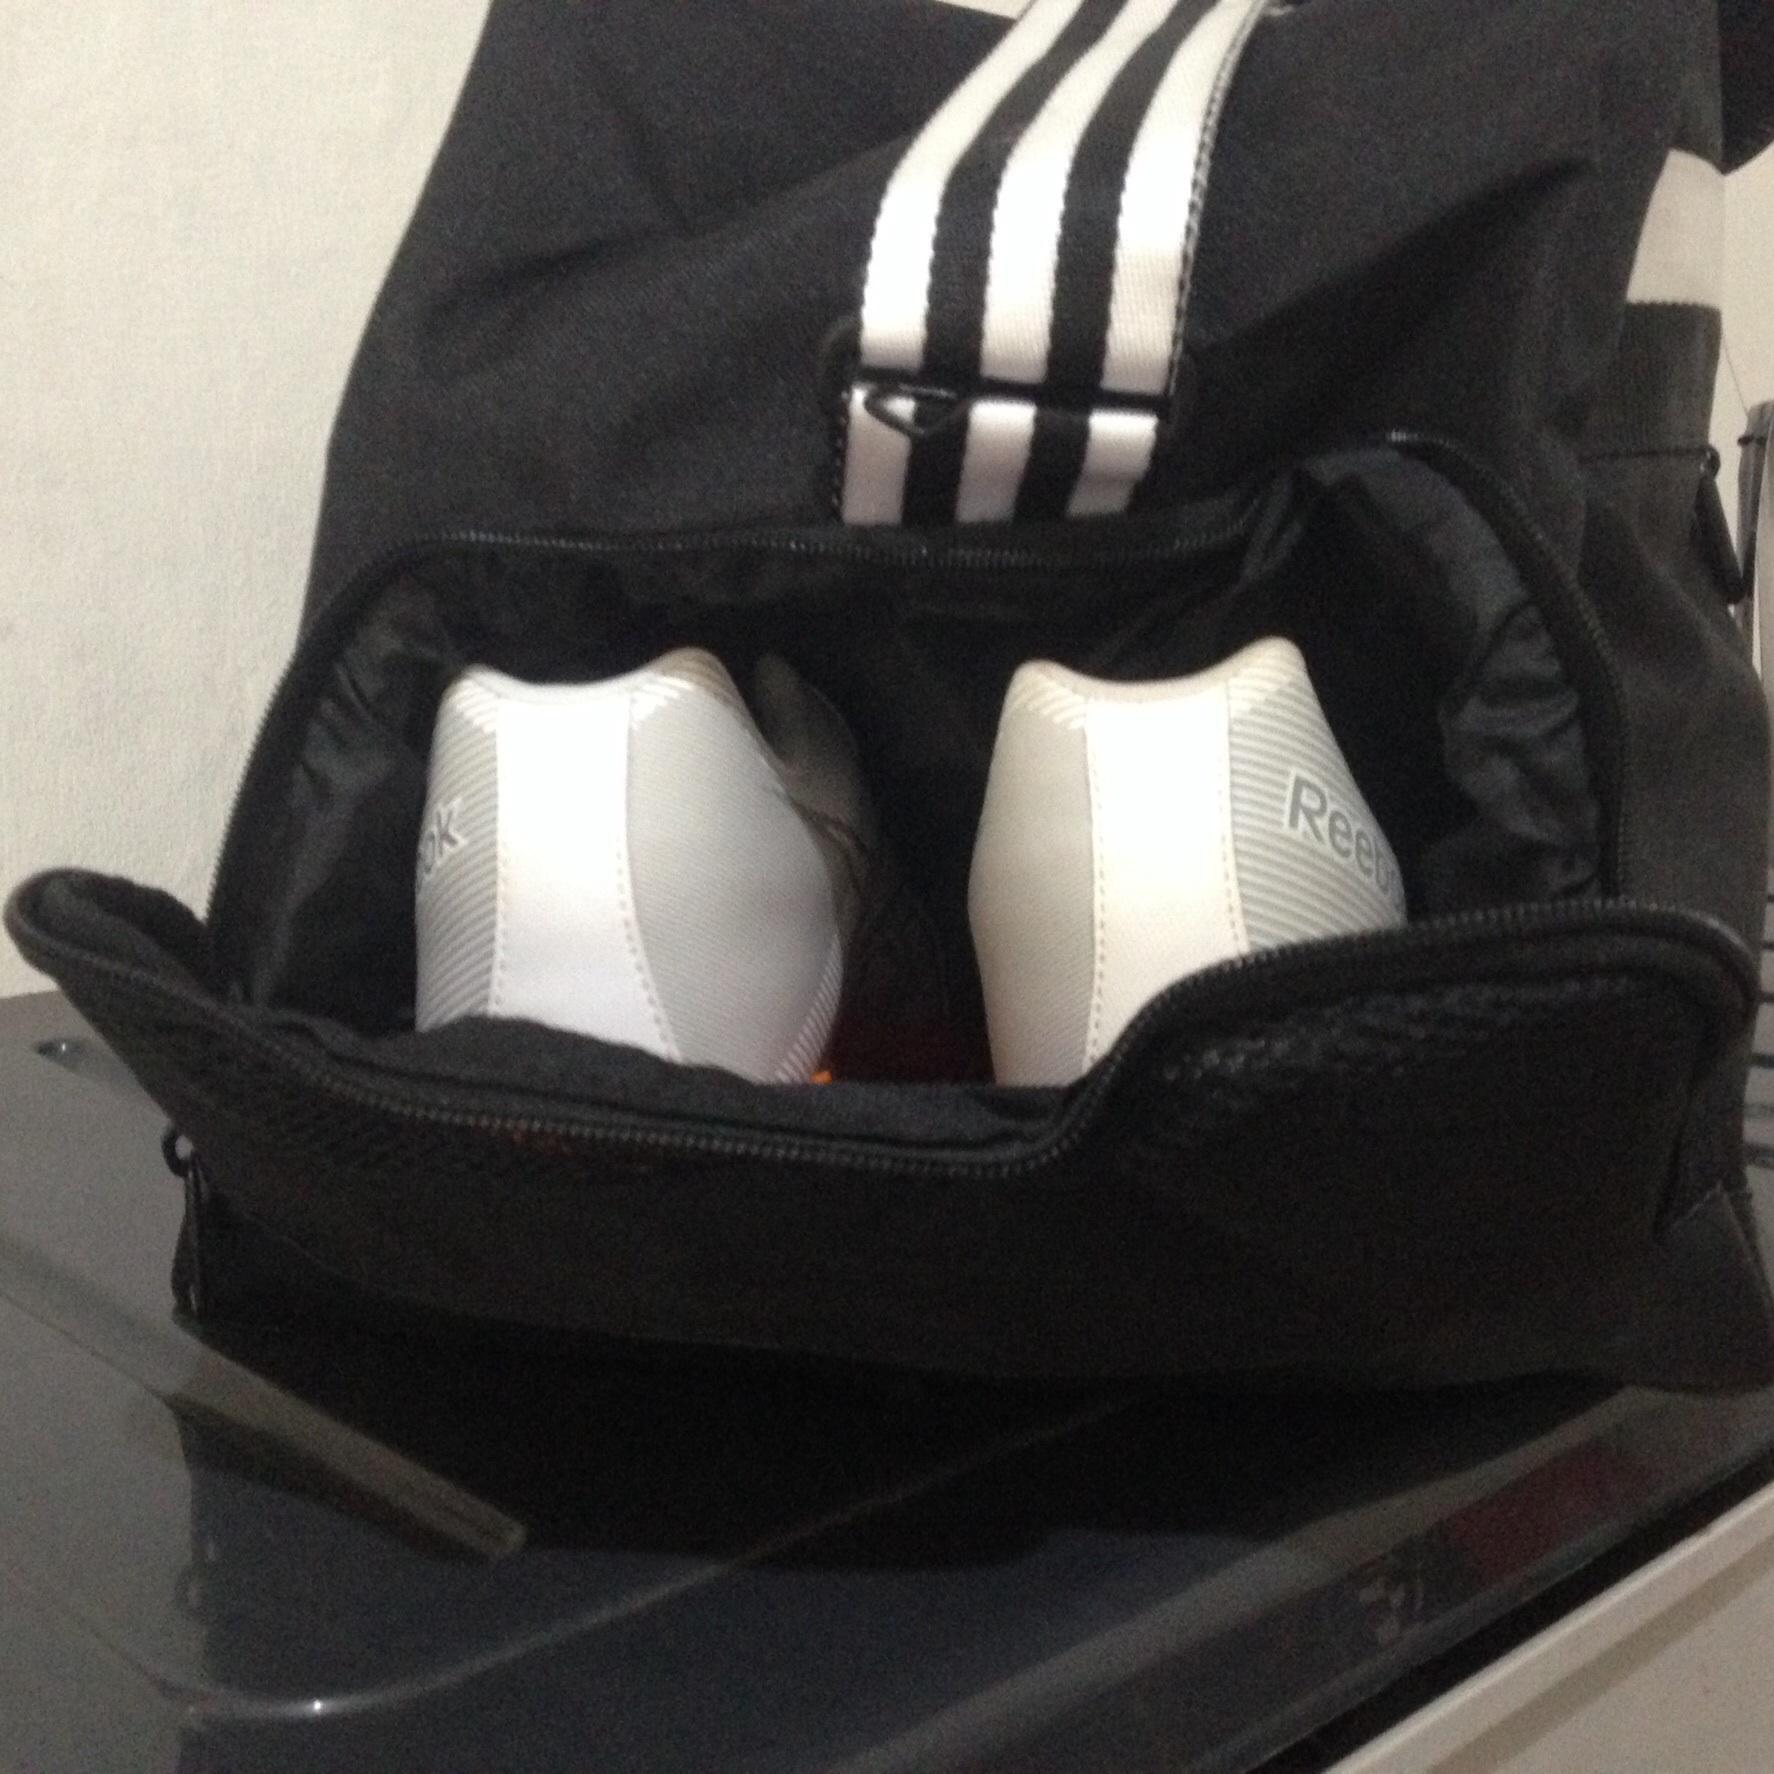 Tas Sepatu Olahraga fitness gym sport shoes bag organizer. Source · Tas Olahraga Fitness Gym